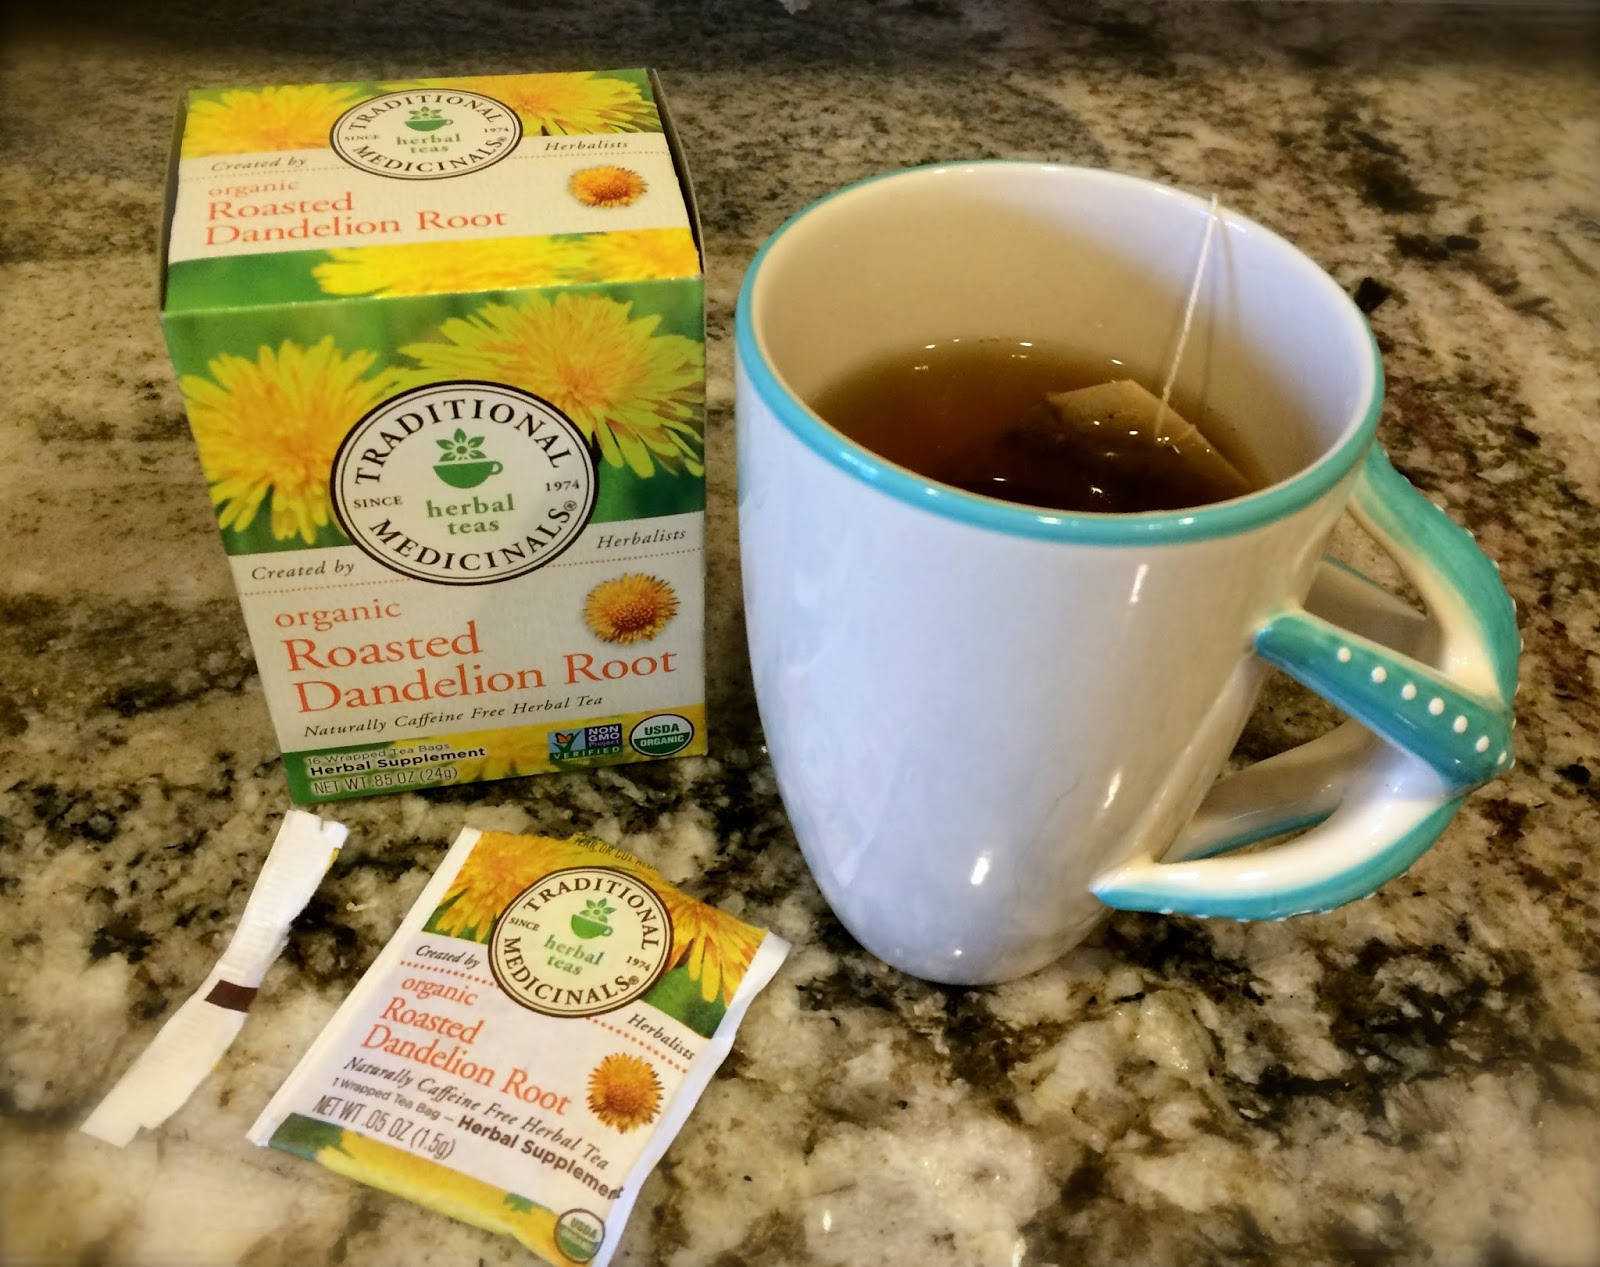 ... : Dandelion Root Tea - My Healthy Caffiene-Free Coffee Alternative